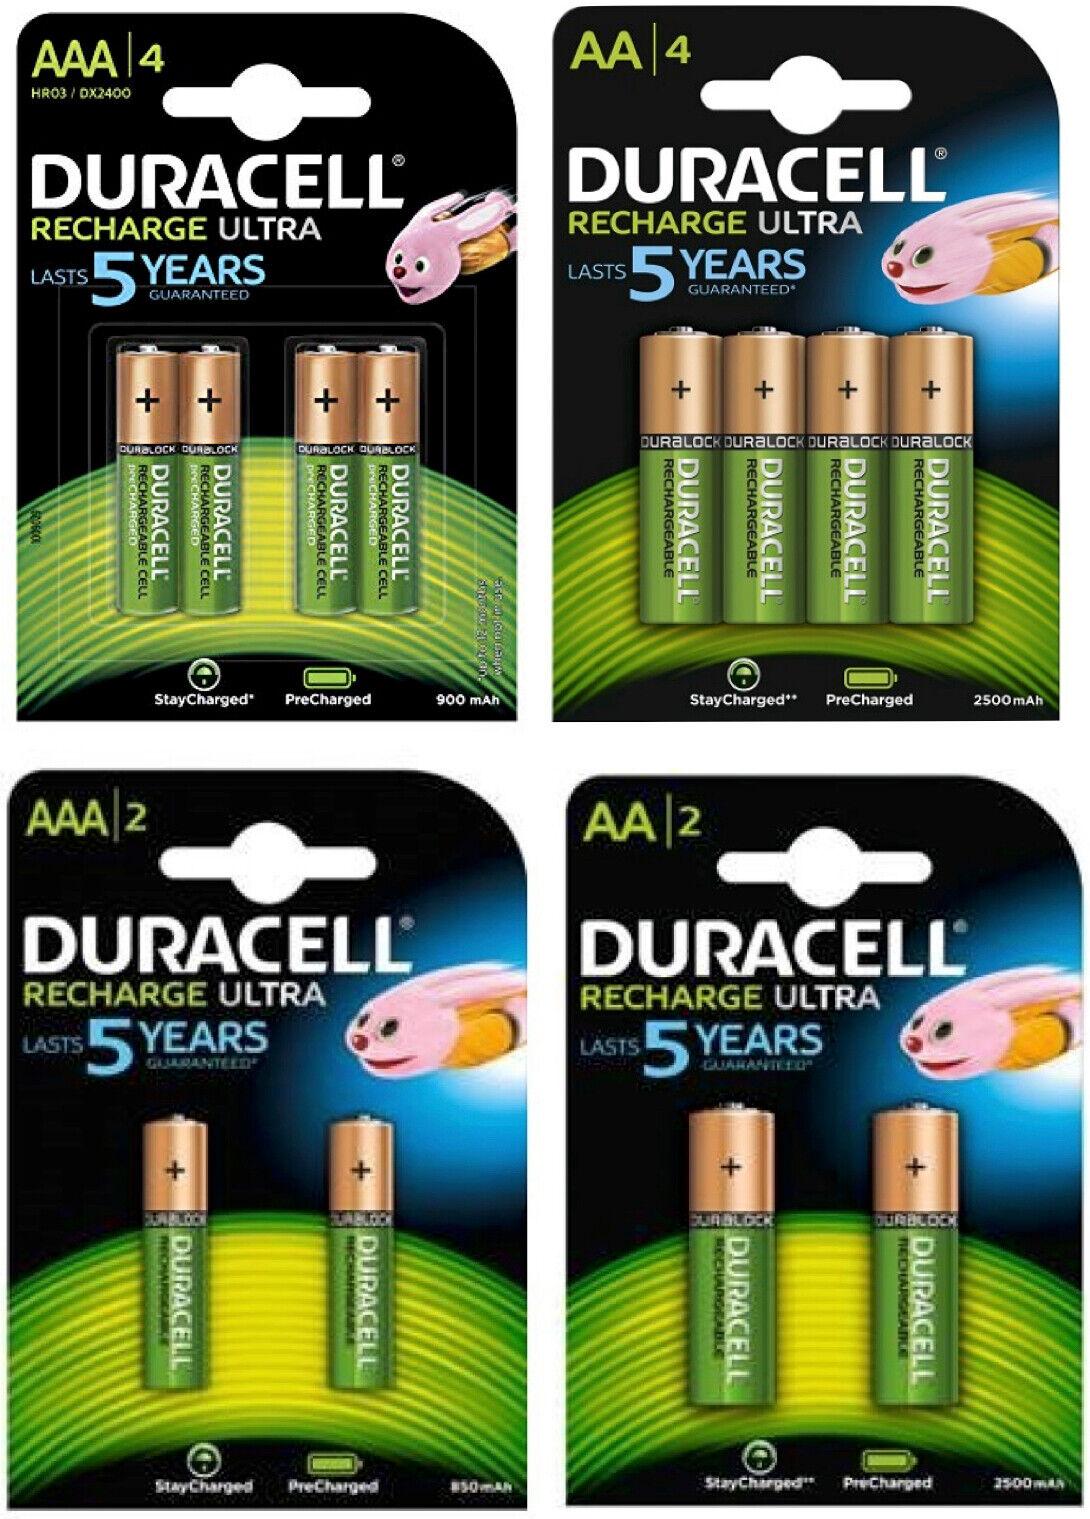 Duracell Recharge Ultra Akkus Accus AAA Micro 900mAh AA Mignon 2500mAh    Fairer Preis